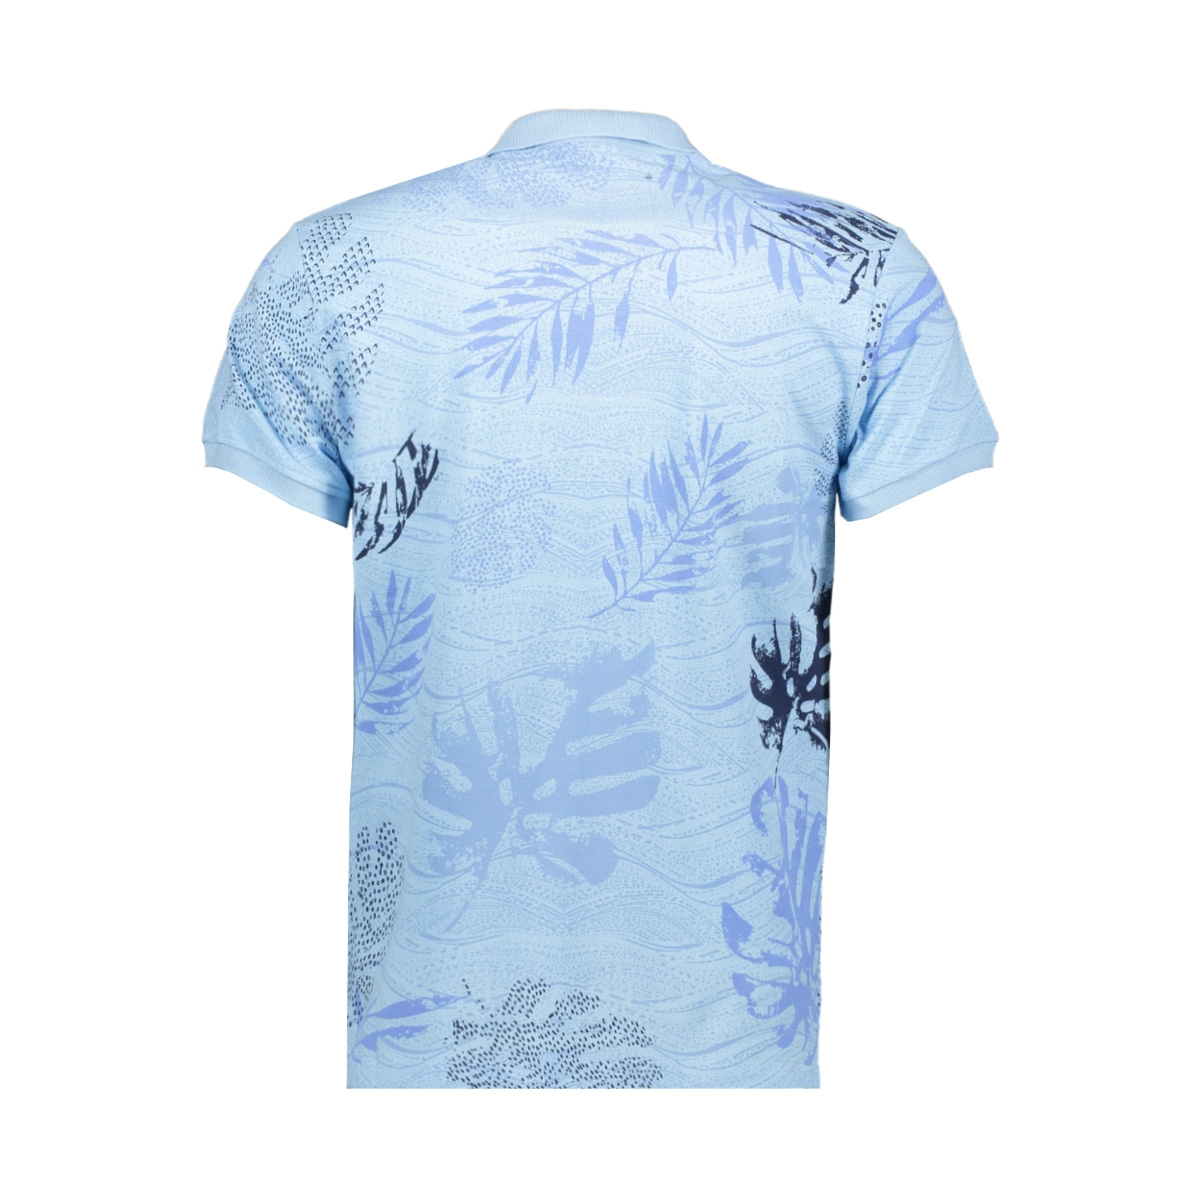 polo shirt 22128 gabbiano polo blue